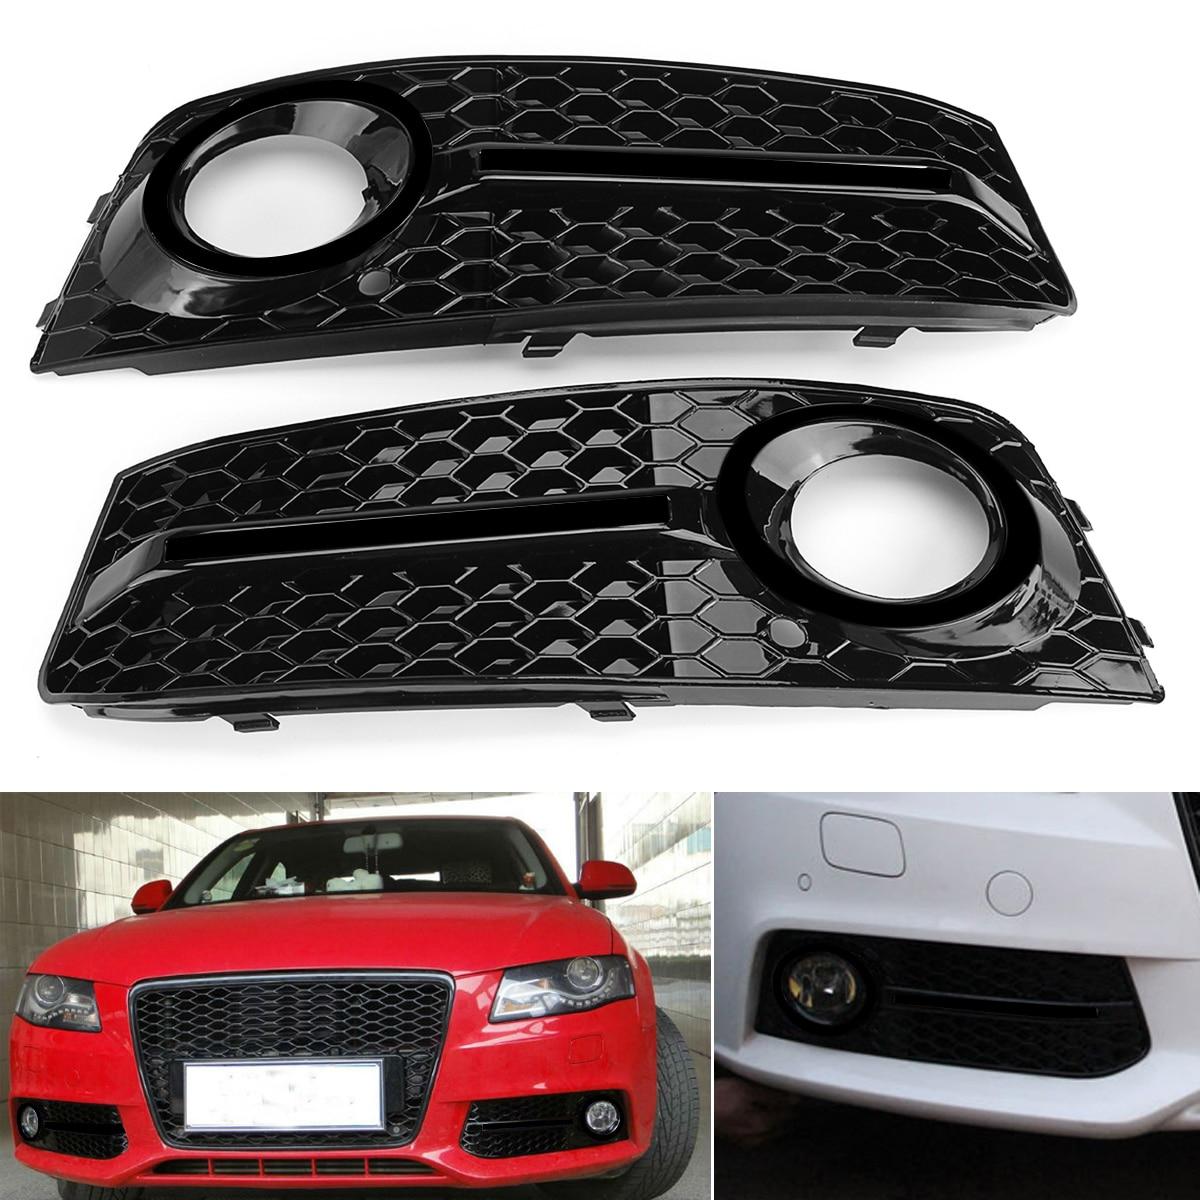 Right Front Bumper Cover Fog Light Trim For BMW X5 E53 03-06 Facelift UE